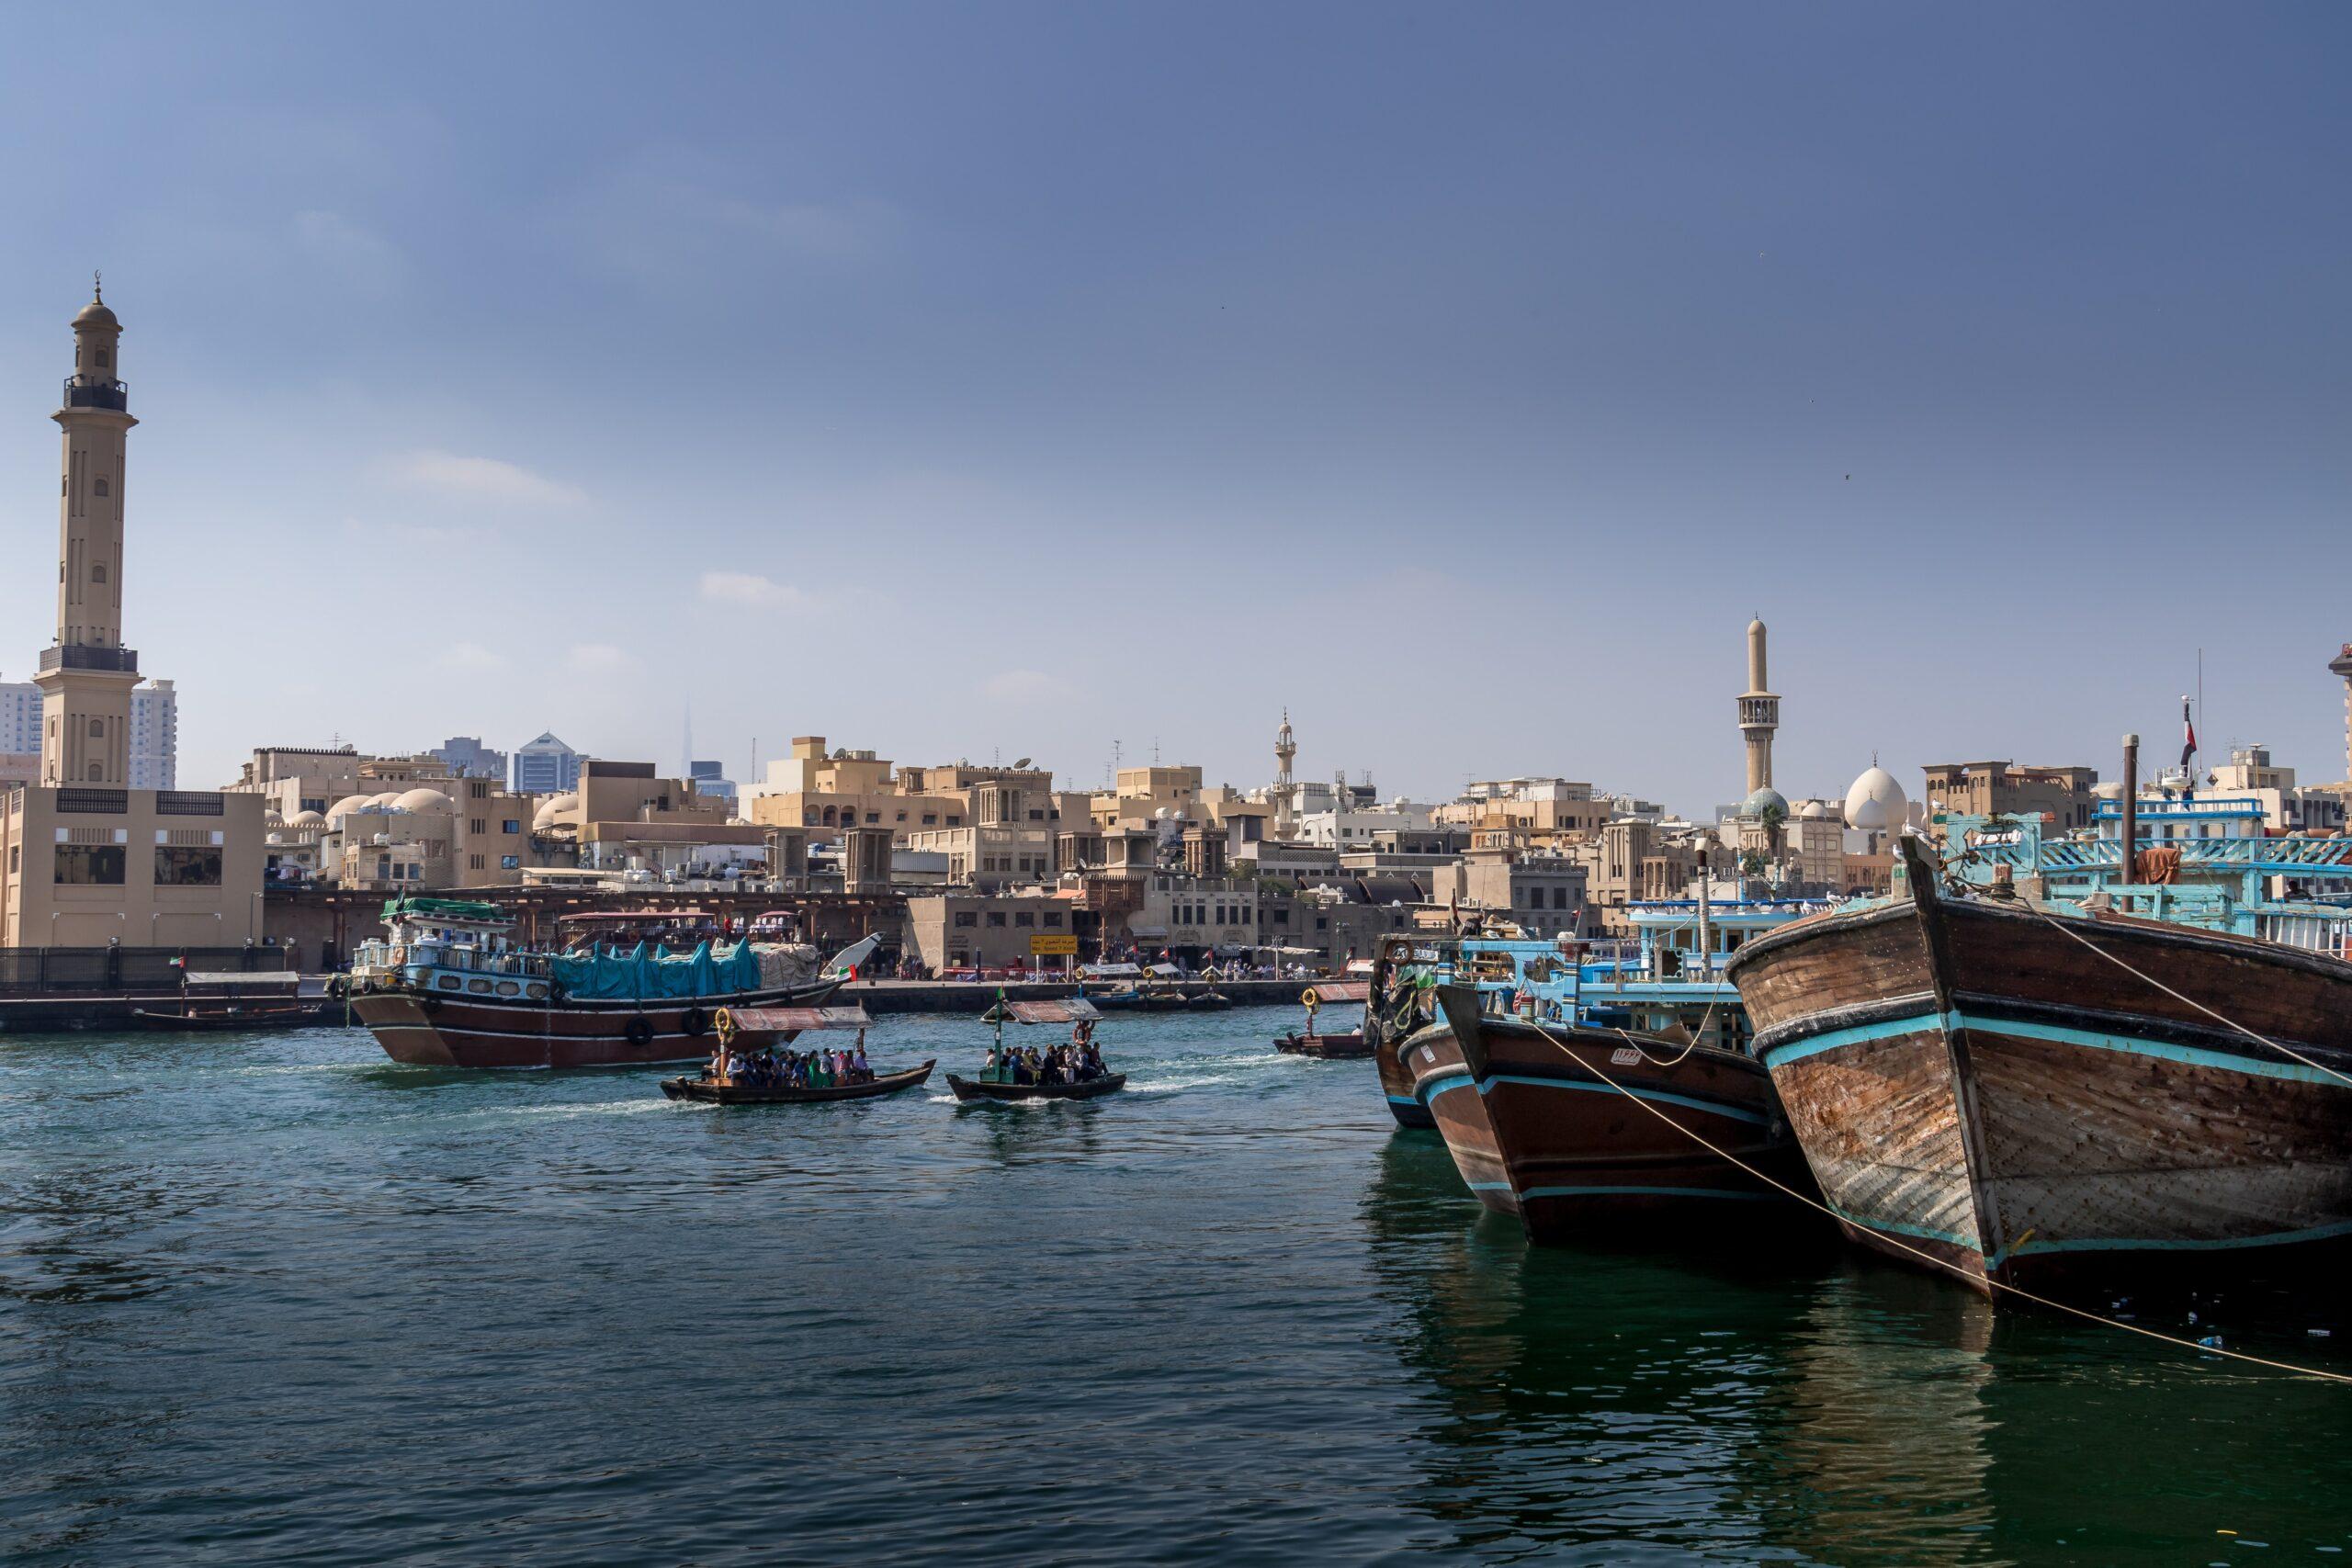 Take A Water Taxi On Our Visit Dubai On Our Classic Dubai Half Day Tour